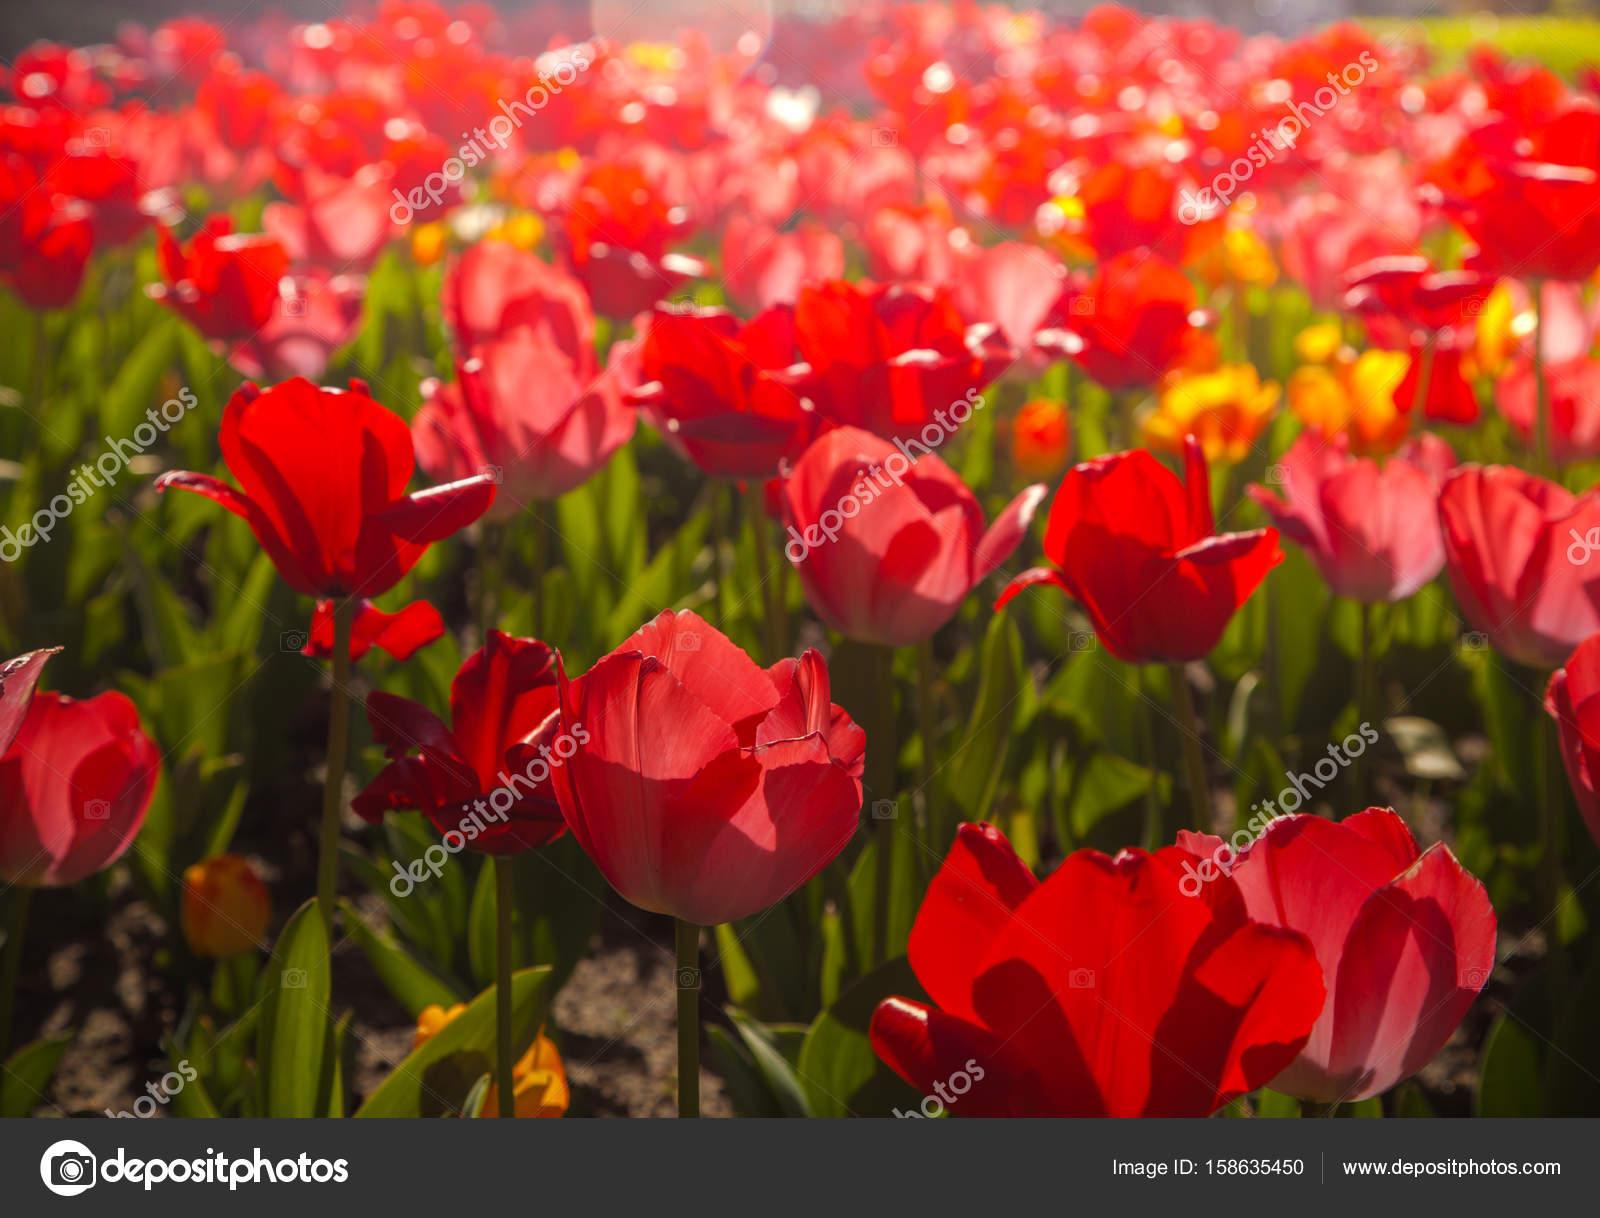 Beautiful tulips flowers in garden stock photo artnature 158635450 beautiful tulips flowers in garden at sunny summer day photo by artnature izmirmasajfo